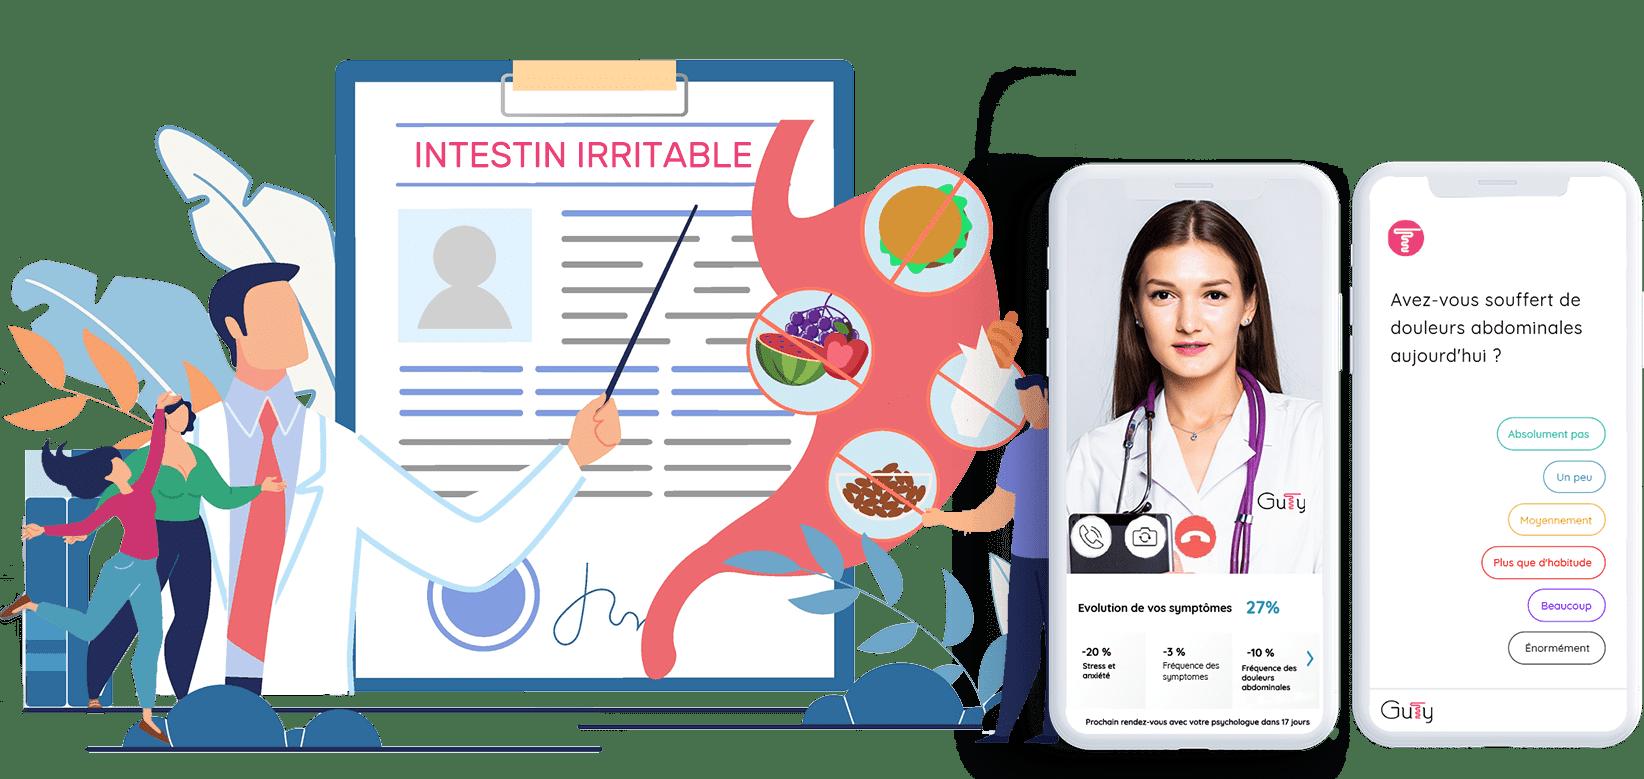 Programme intestin irritable